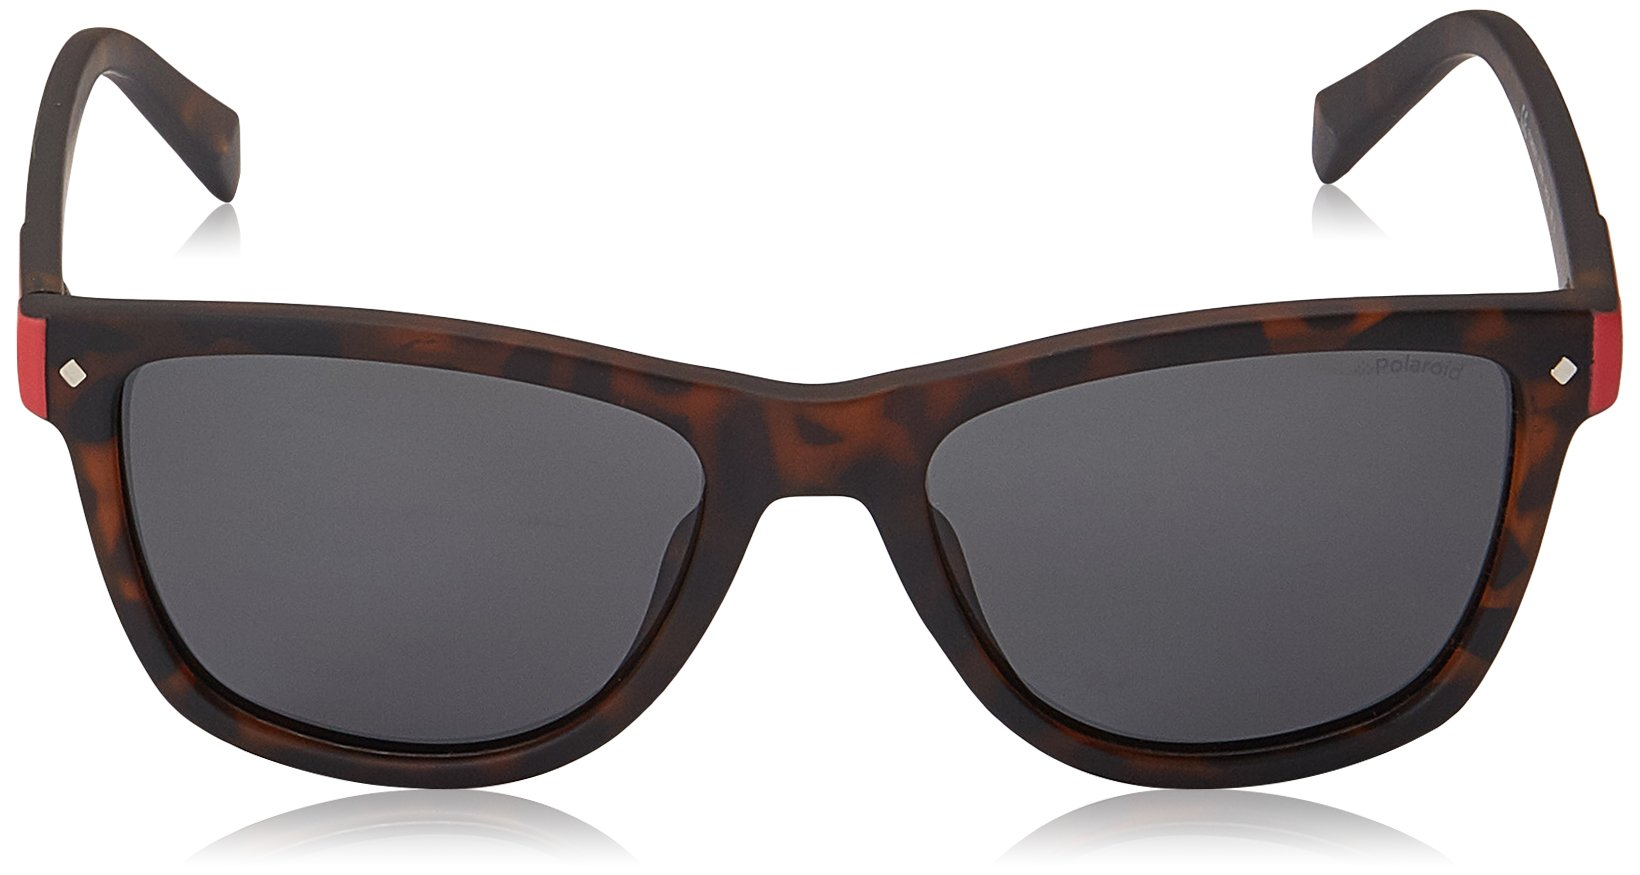 Polaroid Sunglasses Girls' Pld8025s Polarized Rectangular Sunglasses, MATT HVNA, 48 mm by Polaroid Sunglasses (Image #2)